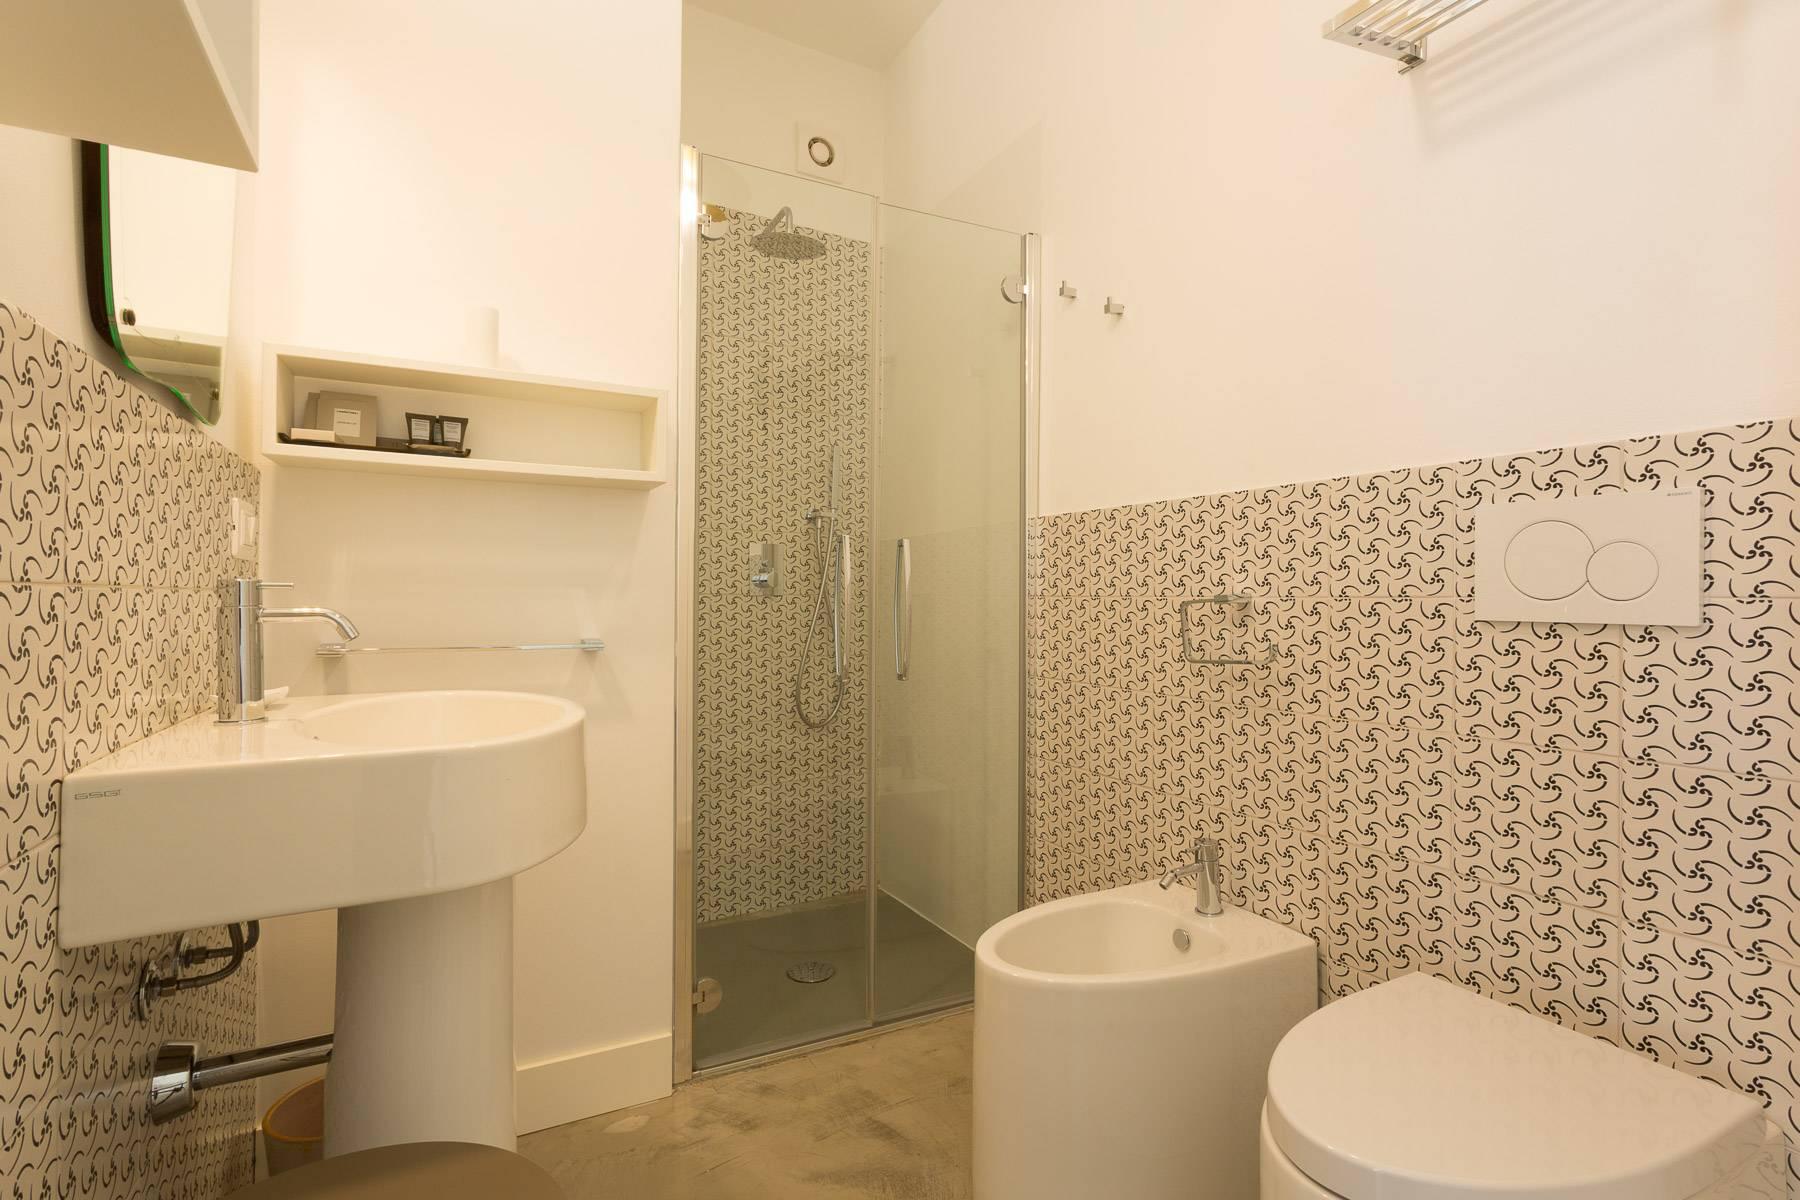 Casa indipendente in Vendita a Noto: 5 locali, 171 mq - Foto 28